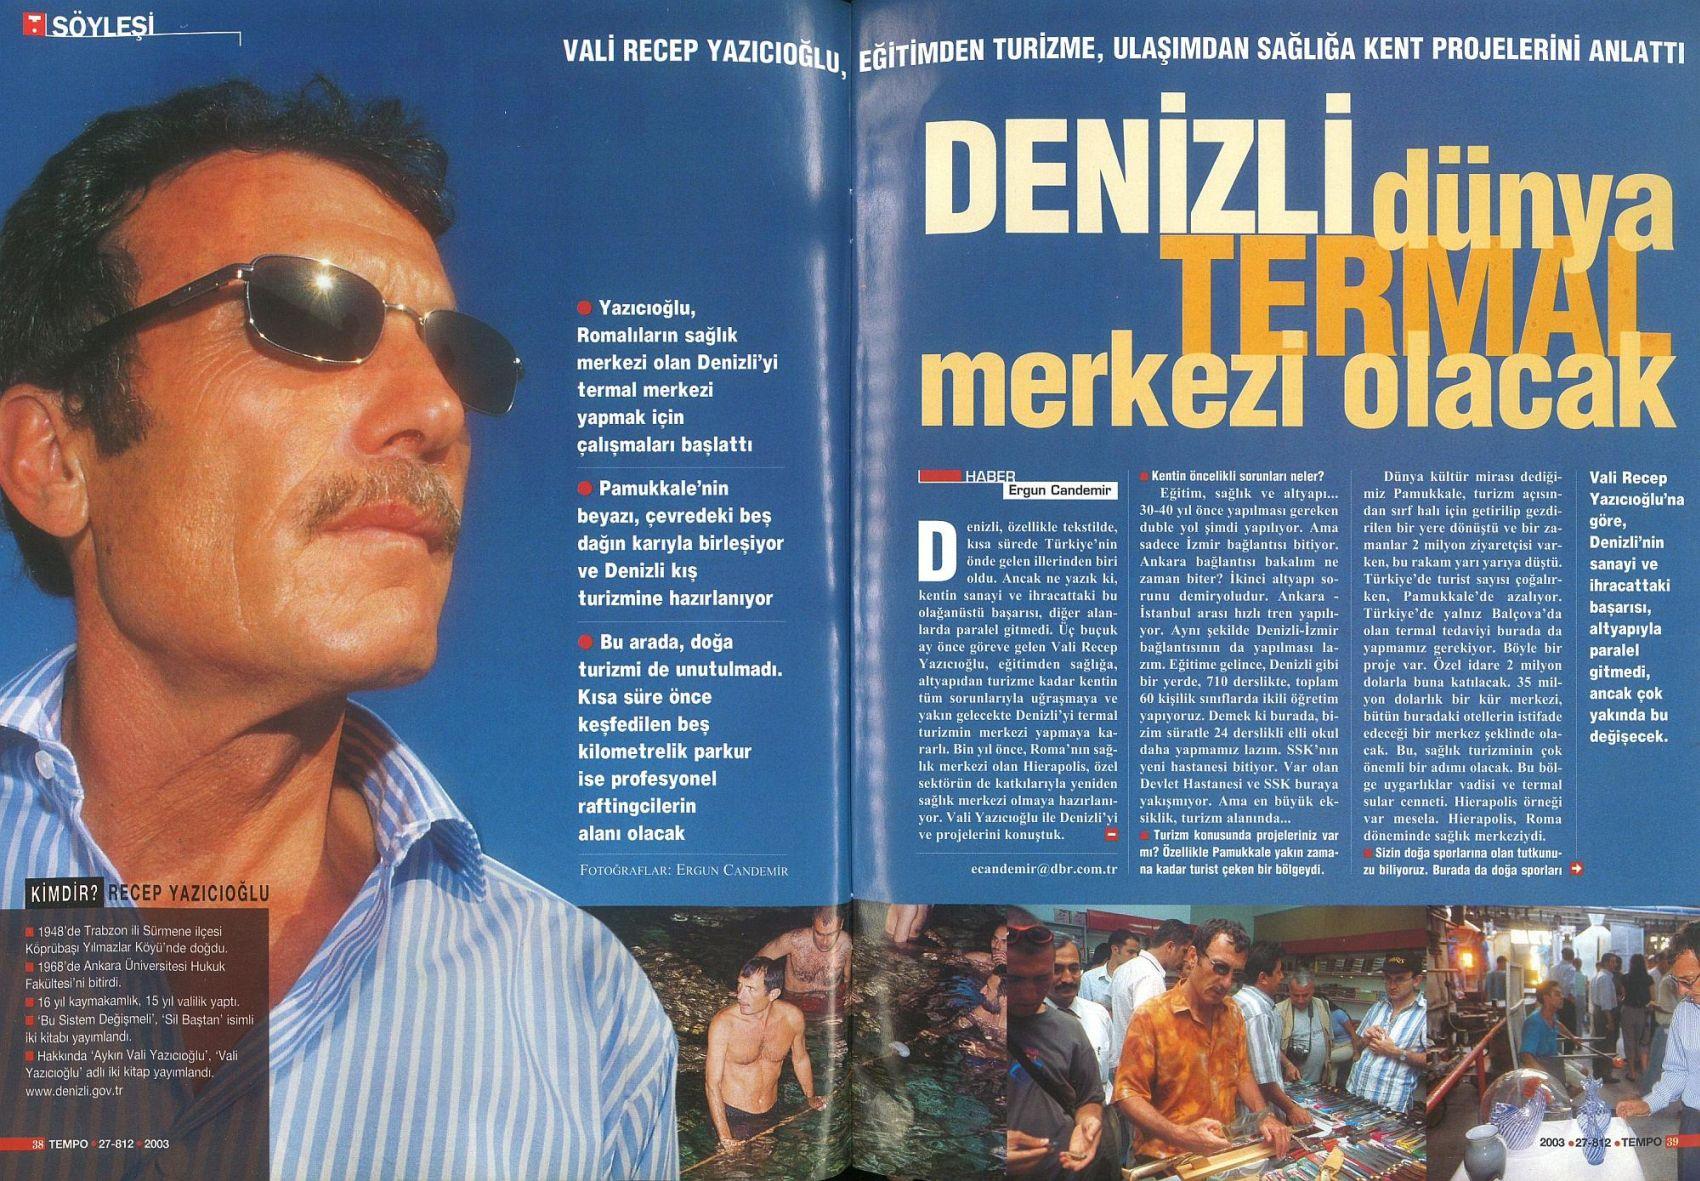 0272-denizli-valisi-recep-yazicioglu-haberleri-2003-tempo-dergisi (2)